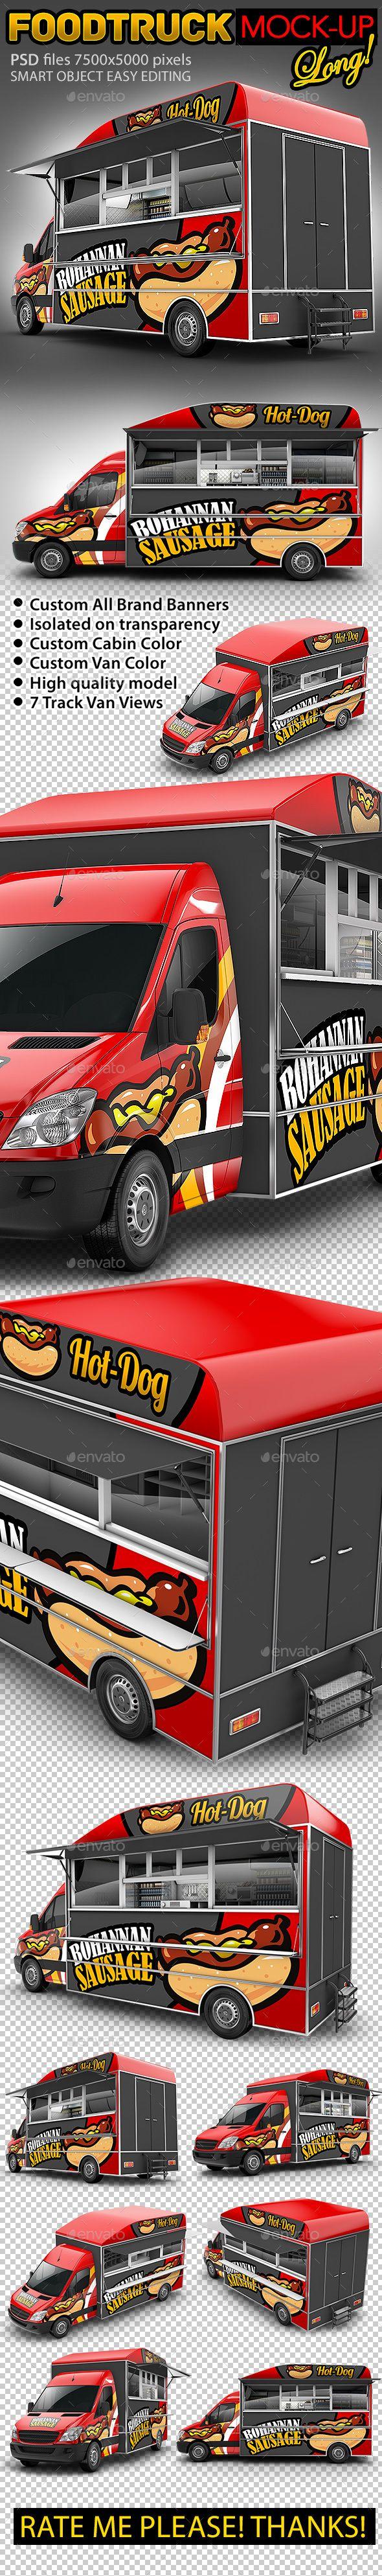 Food Truck HodDog MockUp. Van eatery mockup — Photoshop PSD #taco truck #minibus • Available here → https://graphicriver.net/item/food-truck-hoddog-mockup-van-eatery-mockup/17462490?ref=pxcr